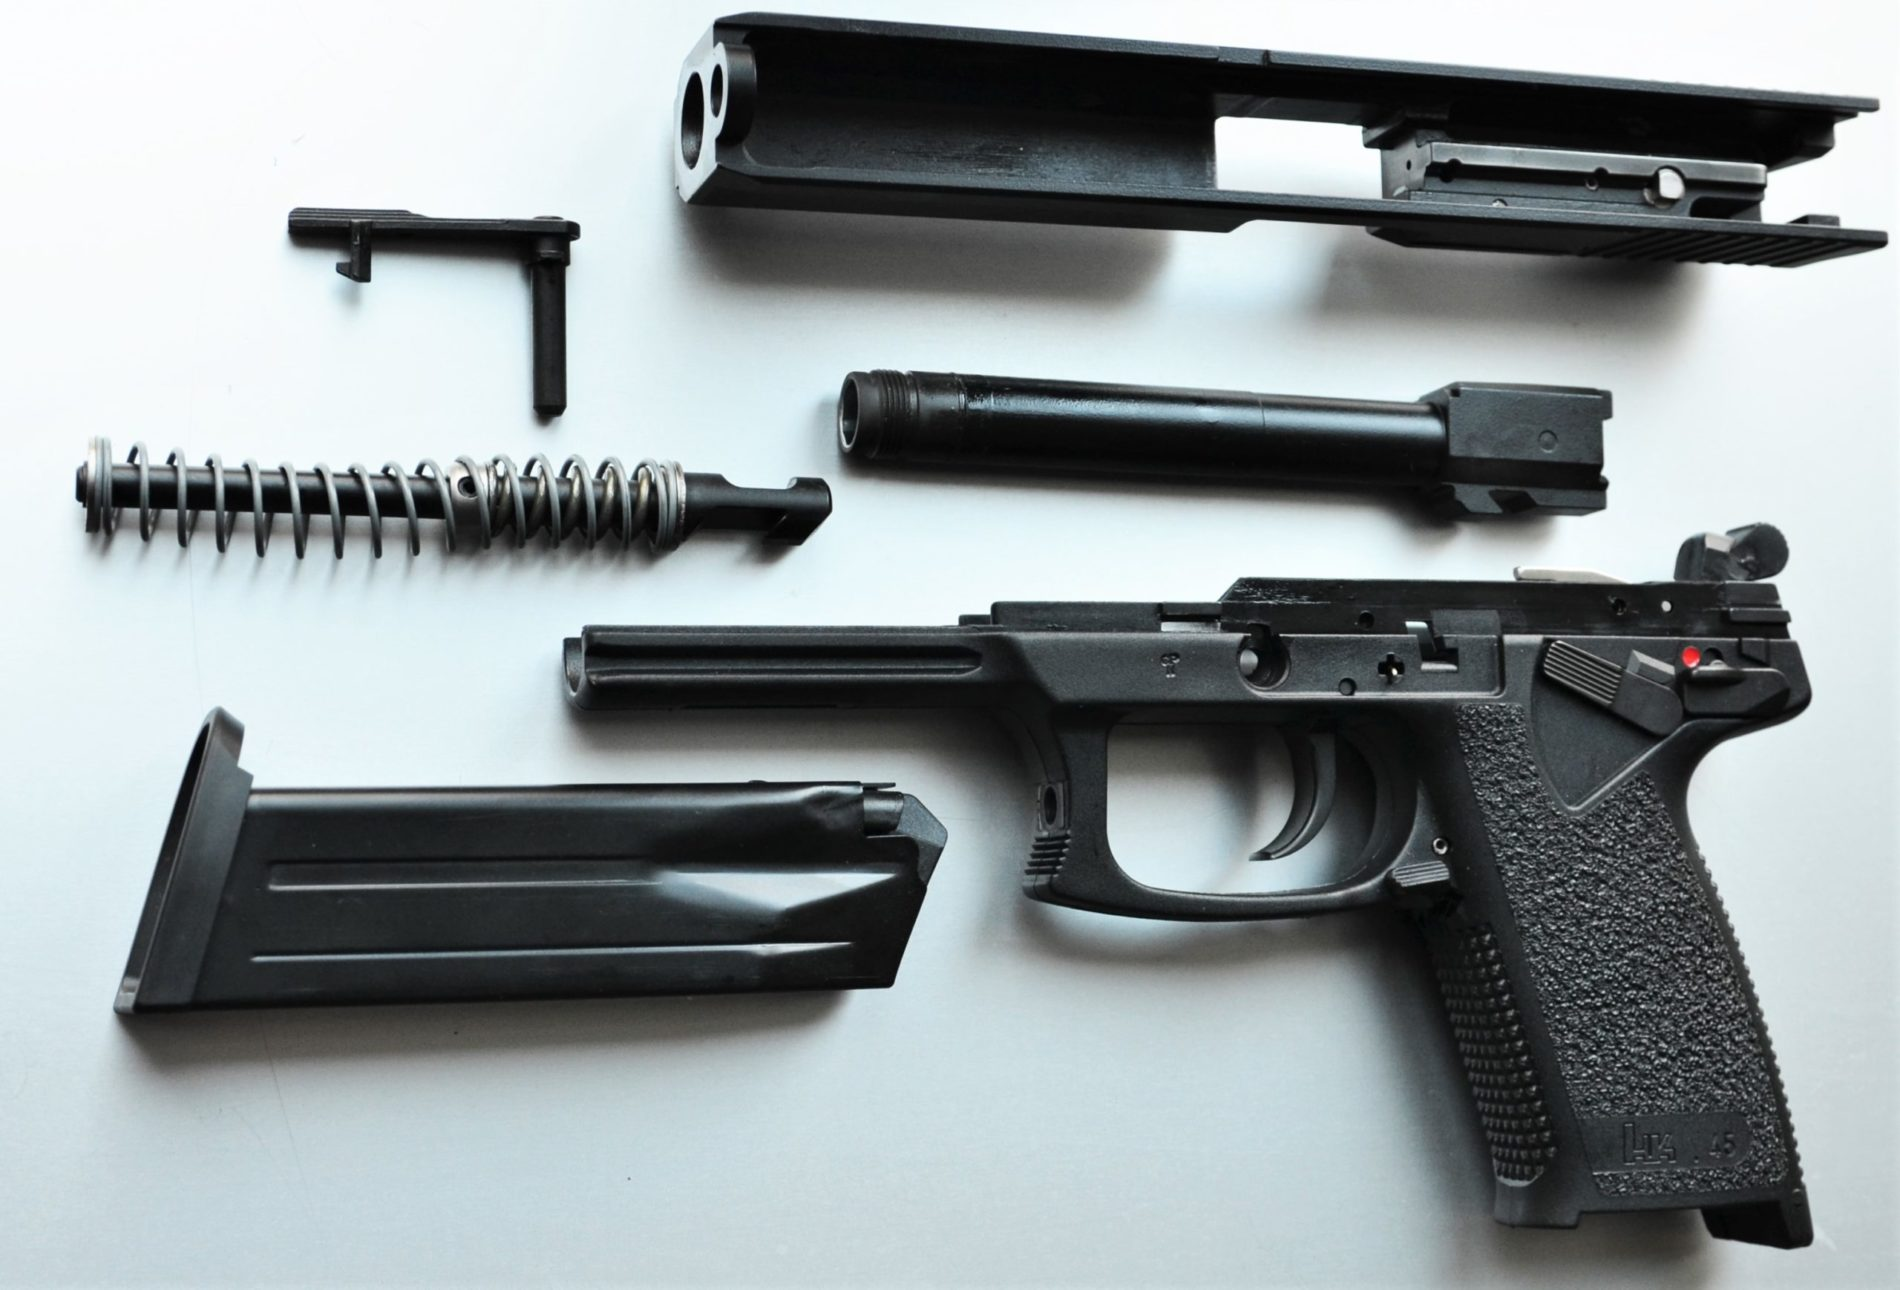 HK Mark 23 Mod 0 SOCOM .45 Auto - halbautomatische Pistole zerlegt